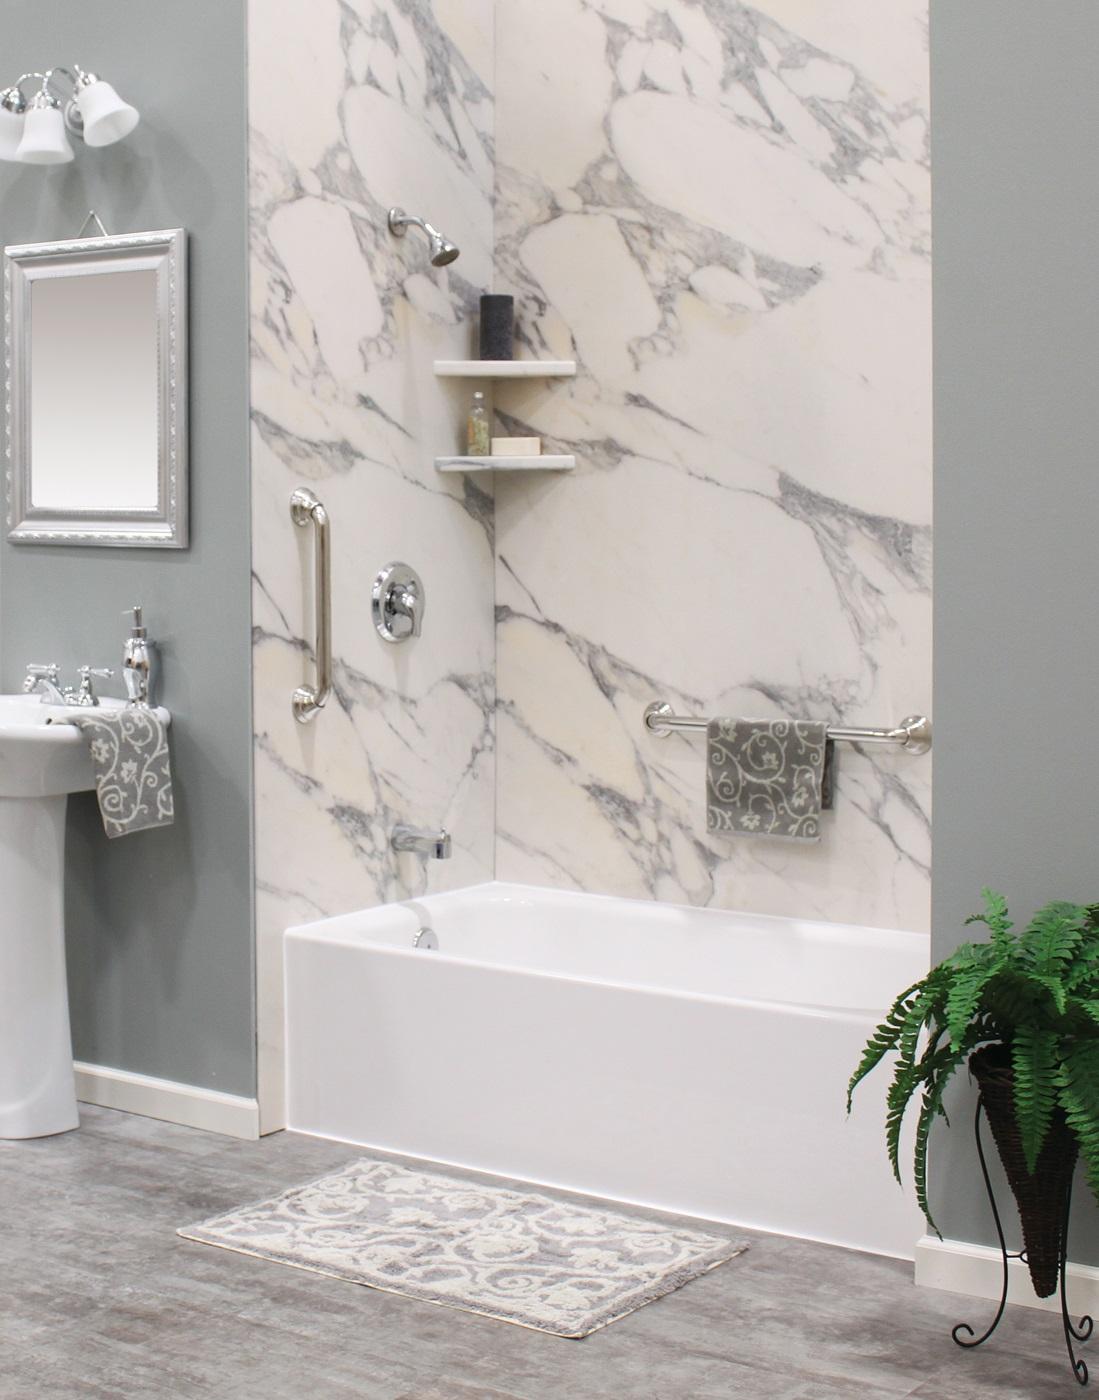 Bathroom Design San Diego | Balance Pretty and Practical |